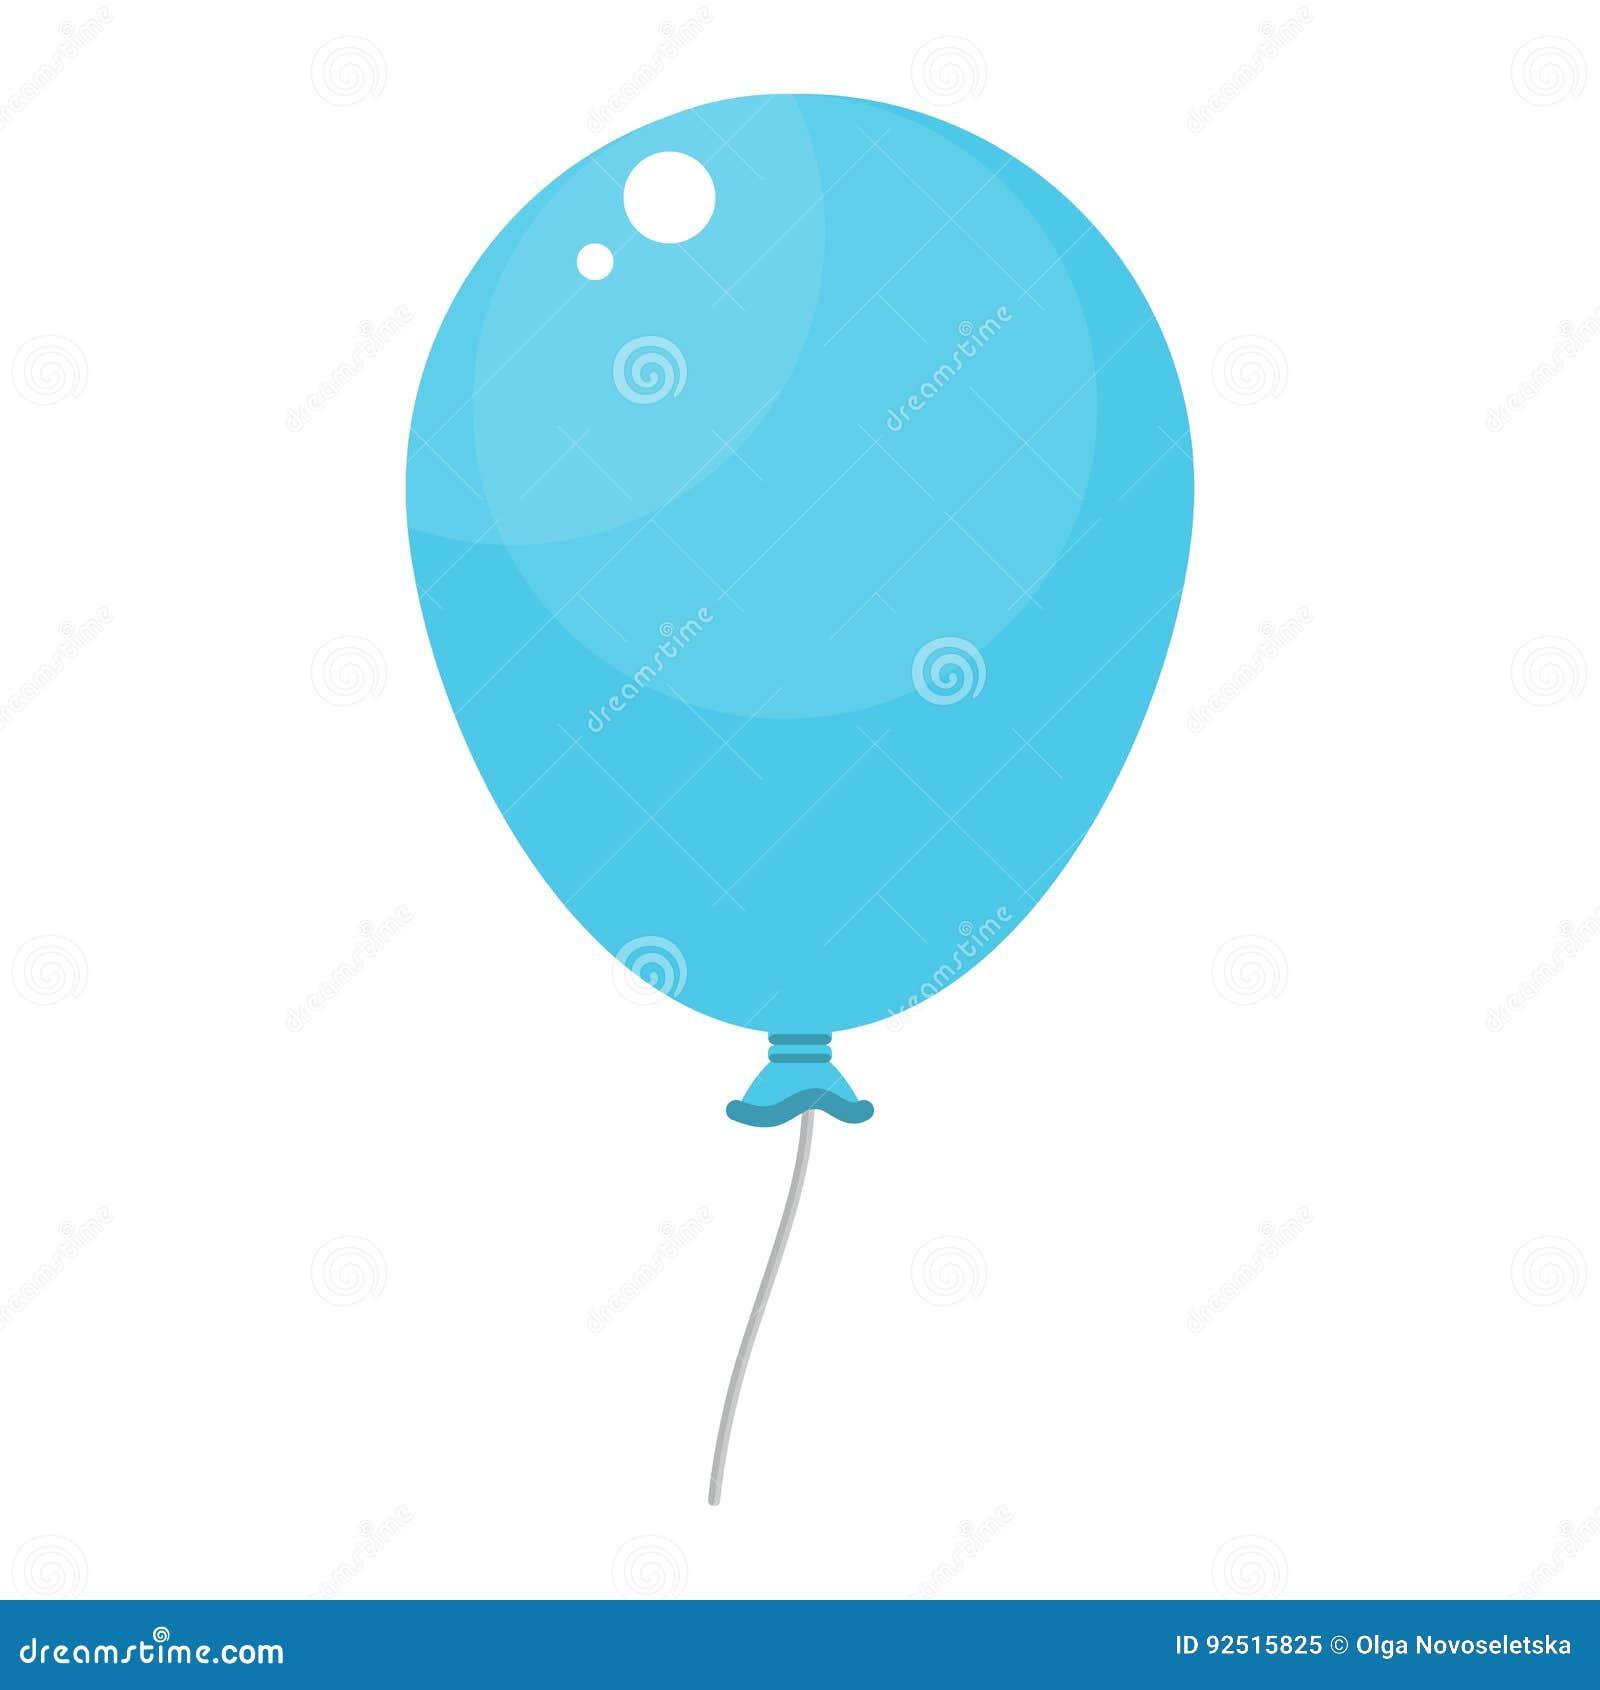 Bright Blue Balloon Stock Vector Illustration Of Concept 92515825